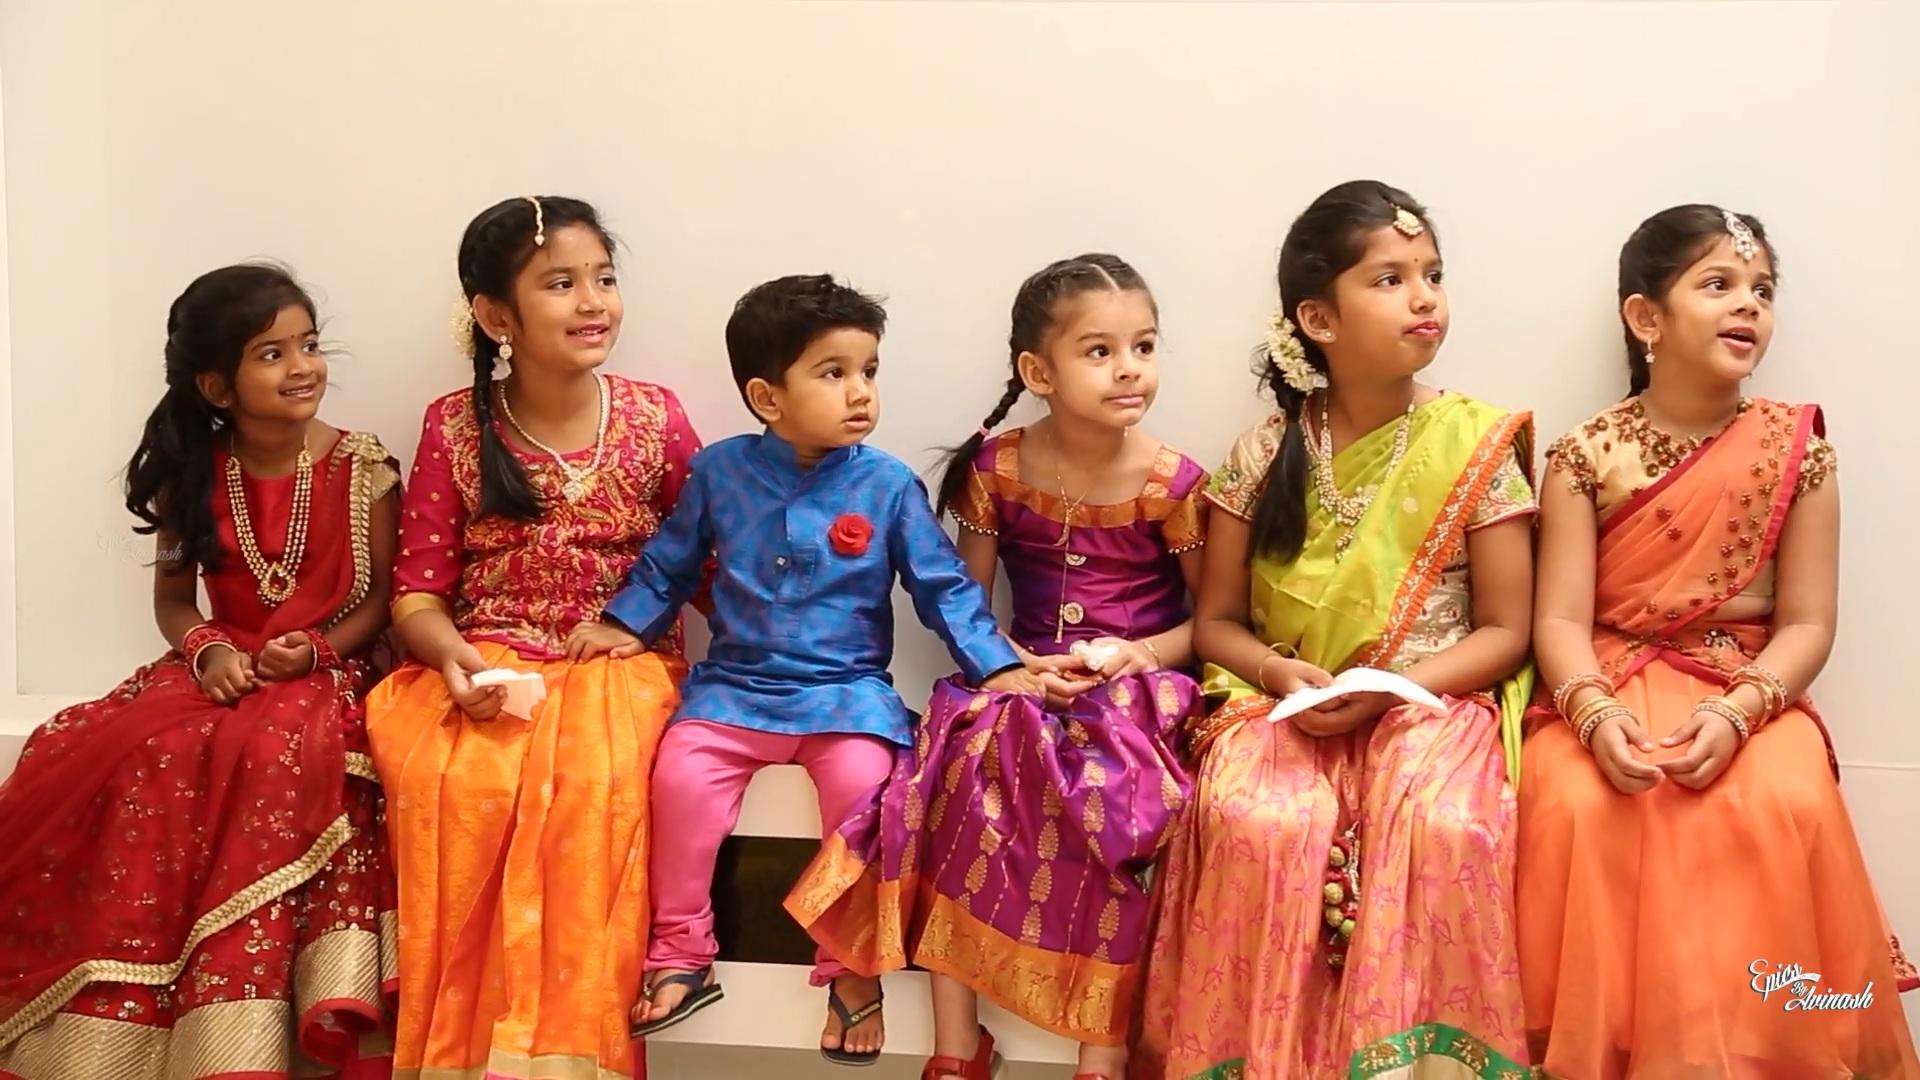 Allu Arjun Sneha Reddy Son Allu Ayaan Latest New HD Photos Images